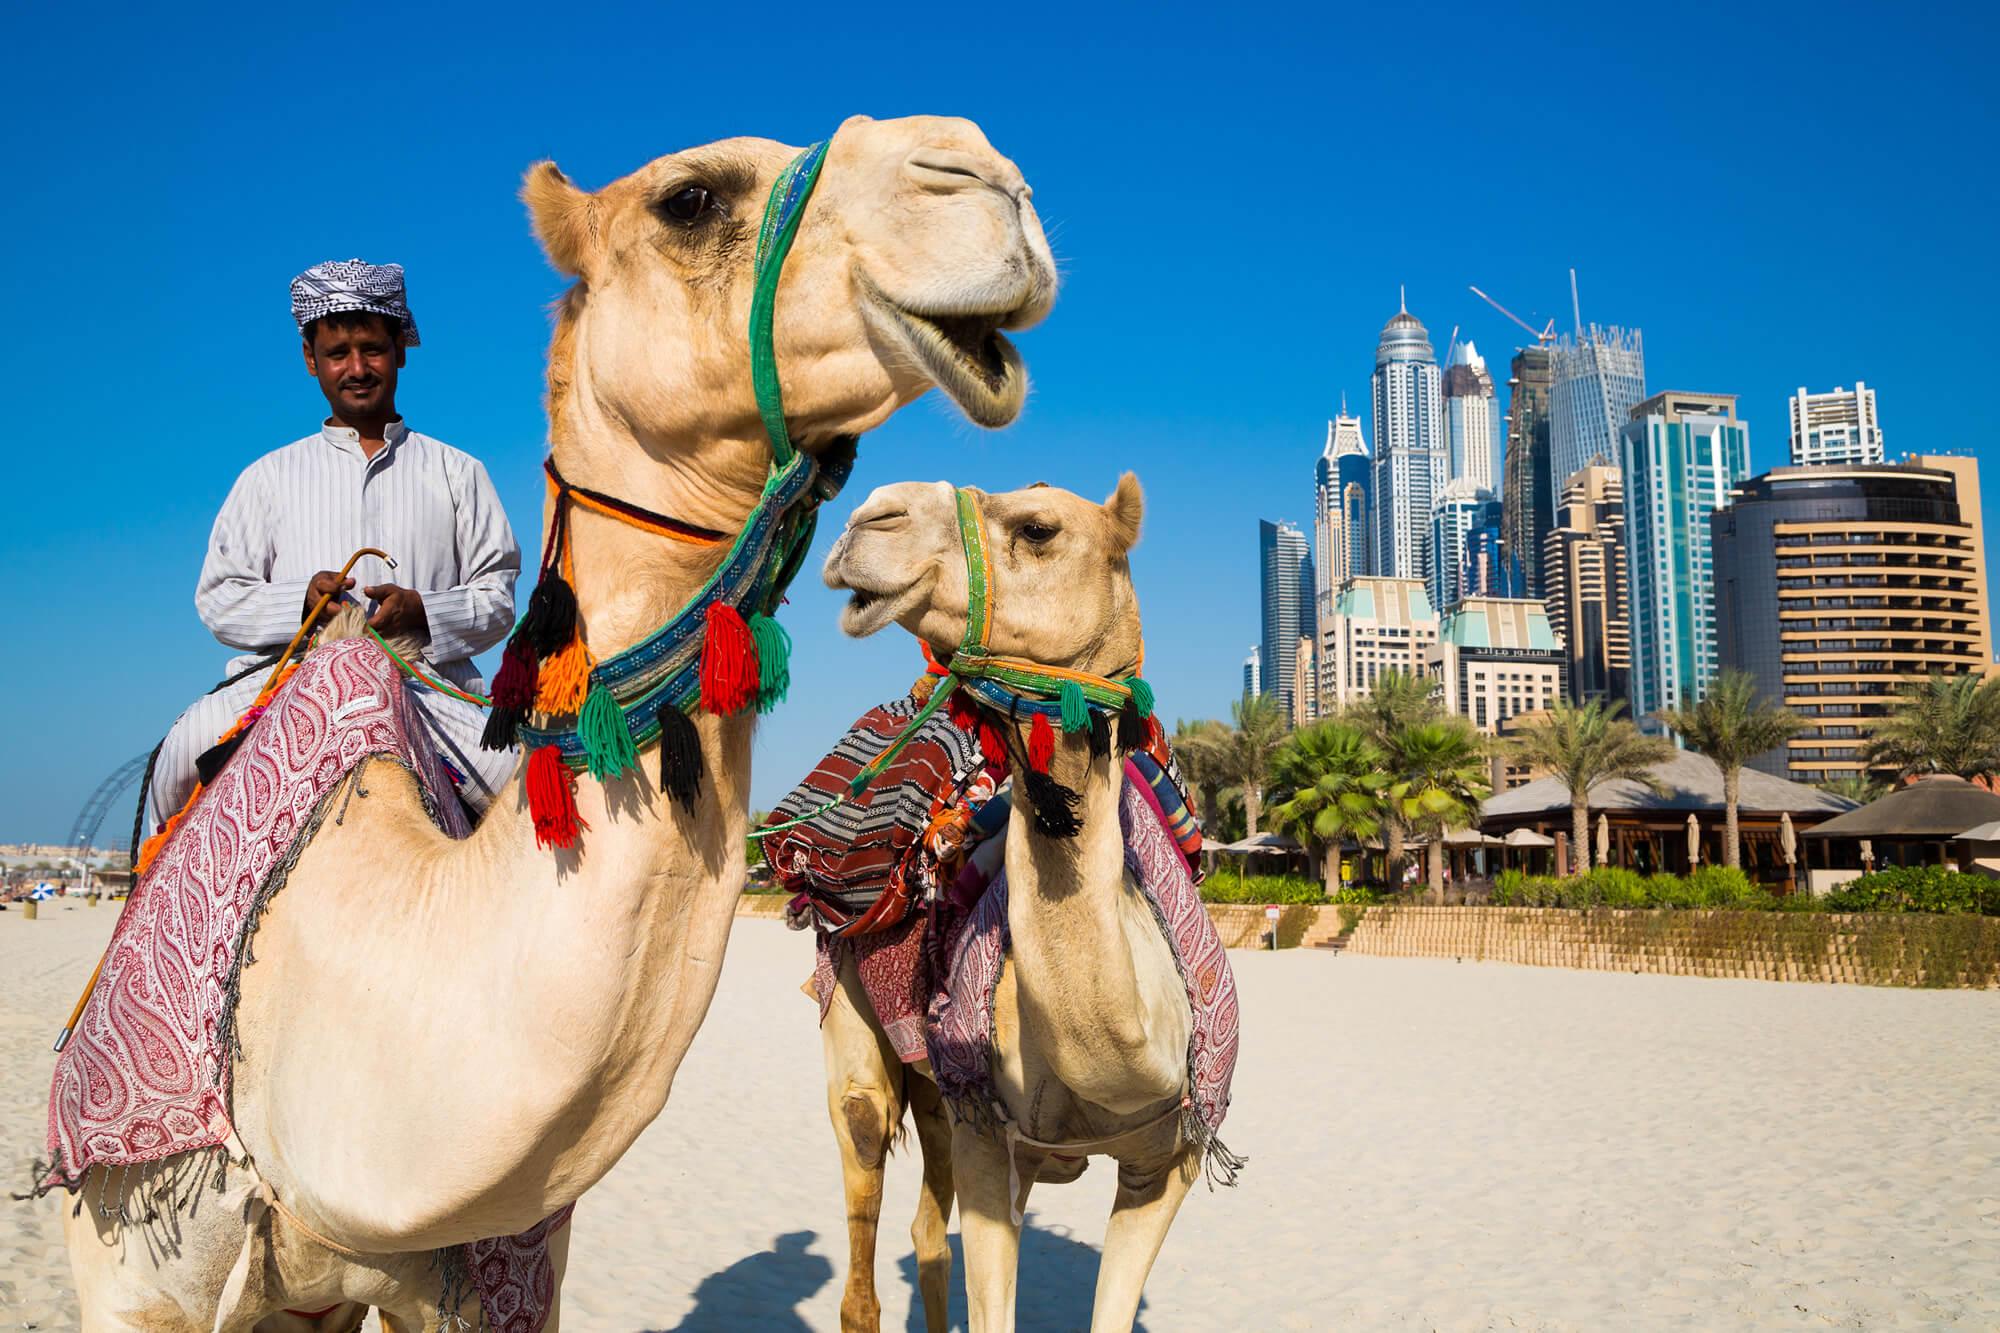 Camels and Dubai Skyscrapers, UAE